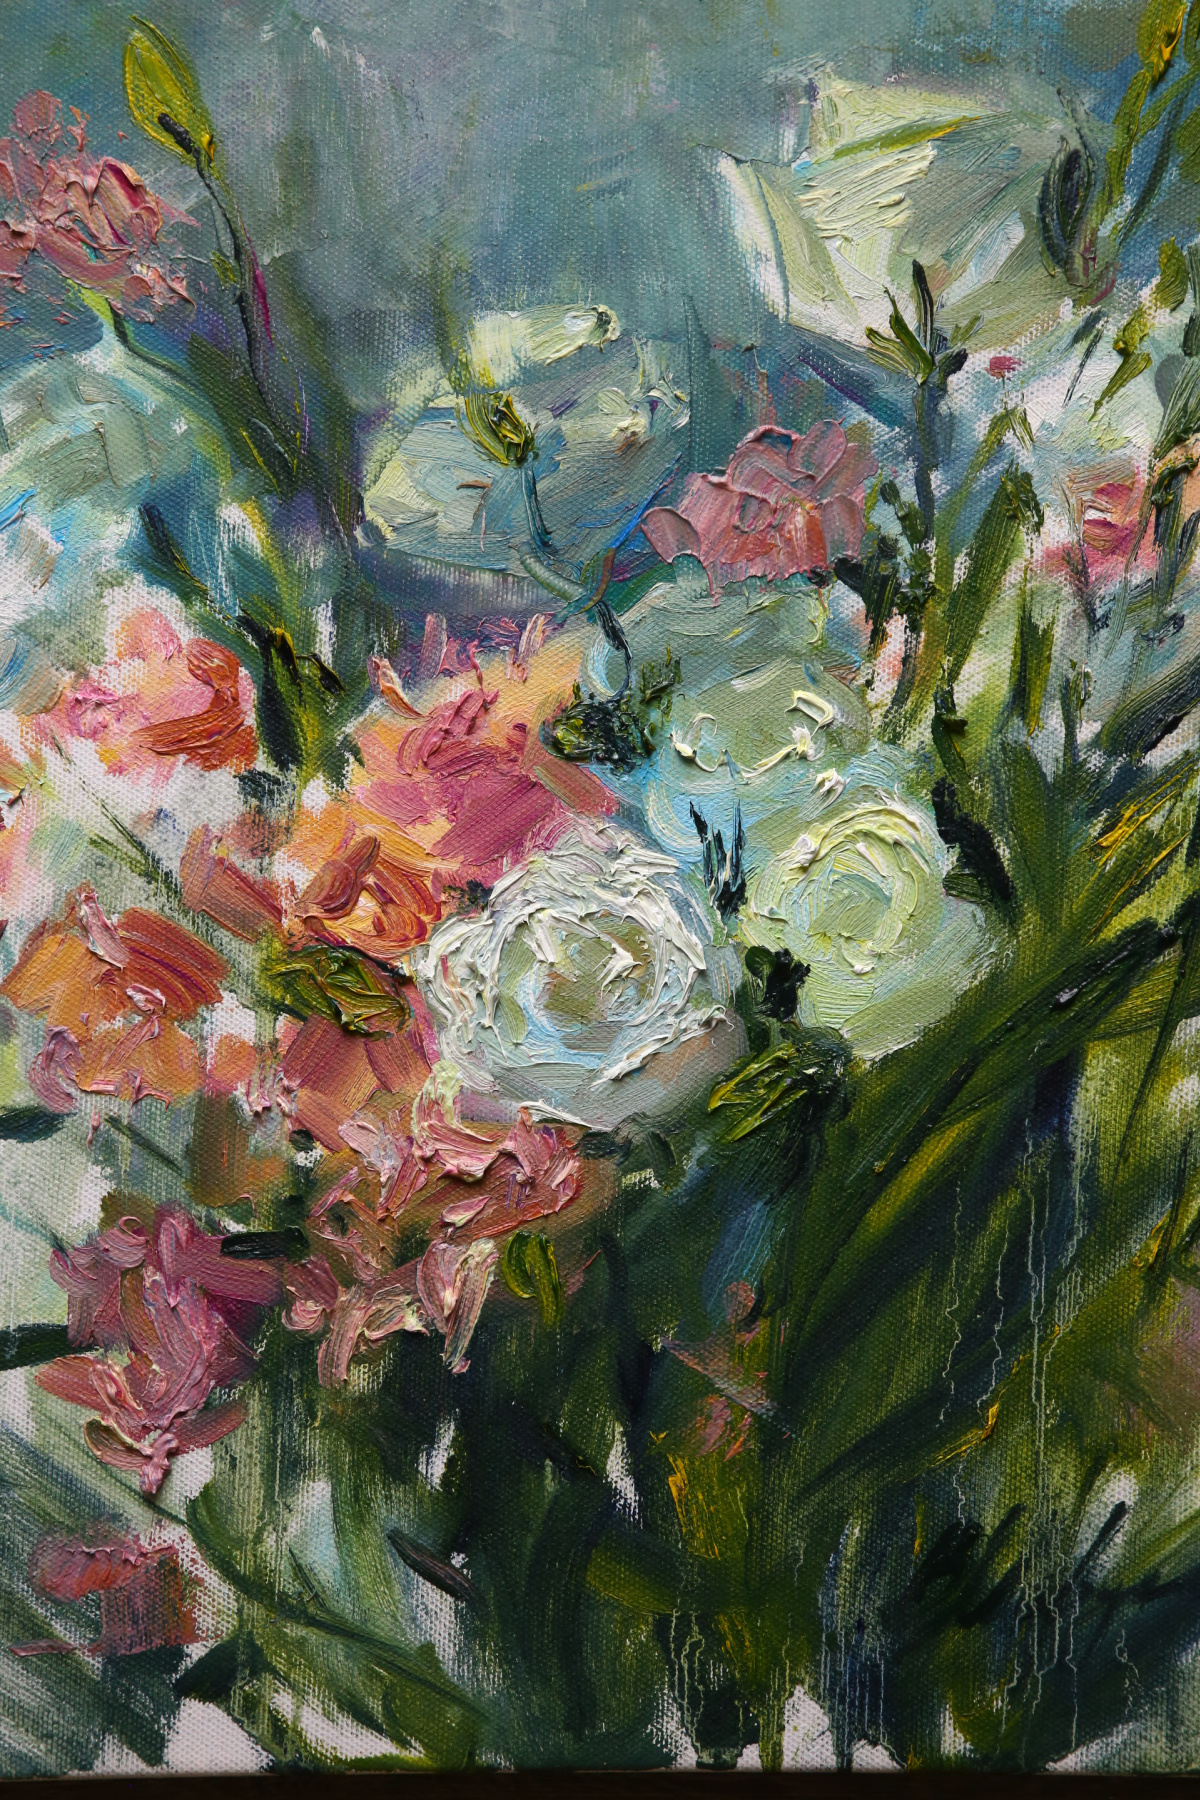 Vera Marueva. The arrival of spring